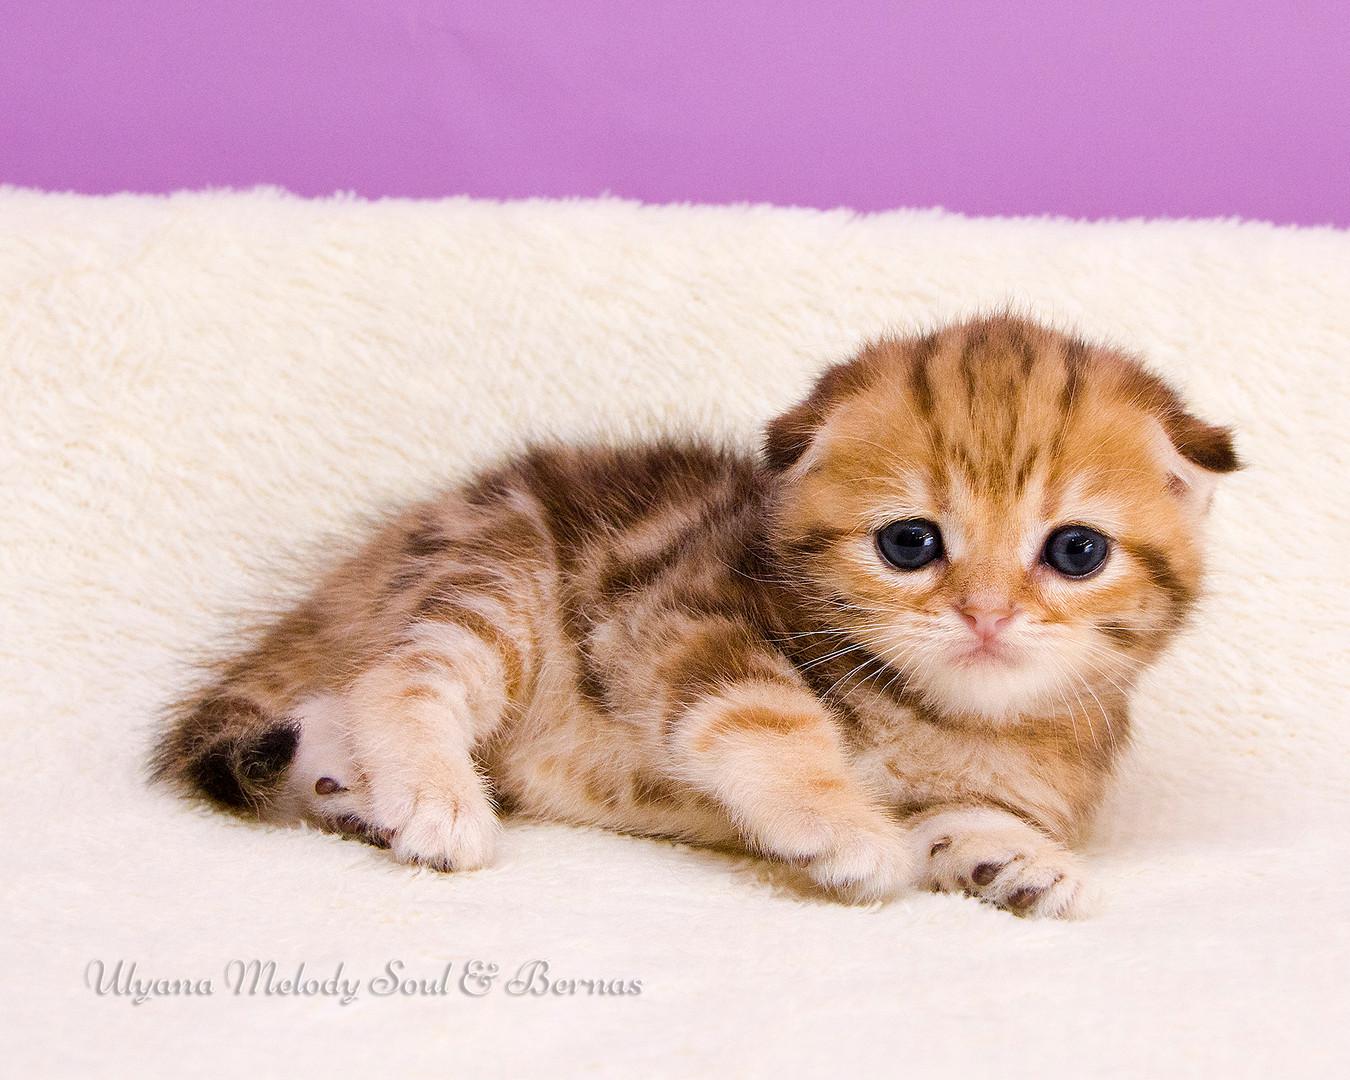 Вислоухая короткошерстная кошка